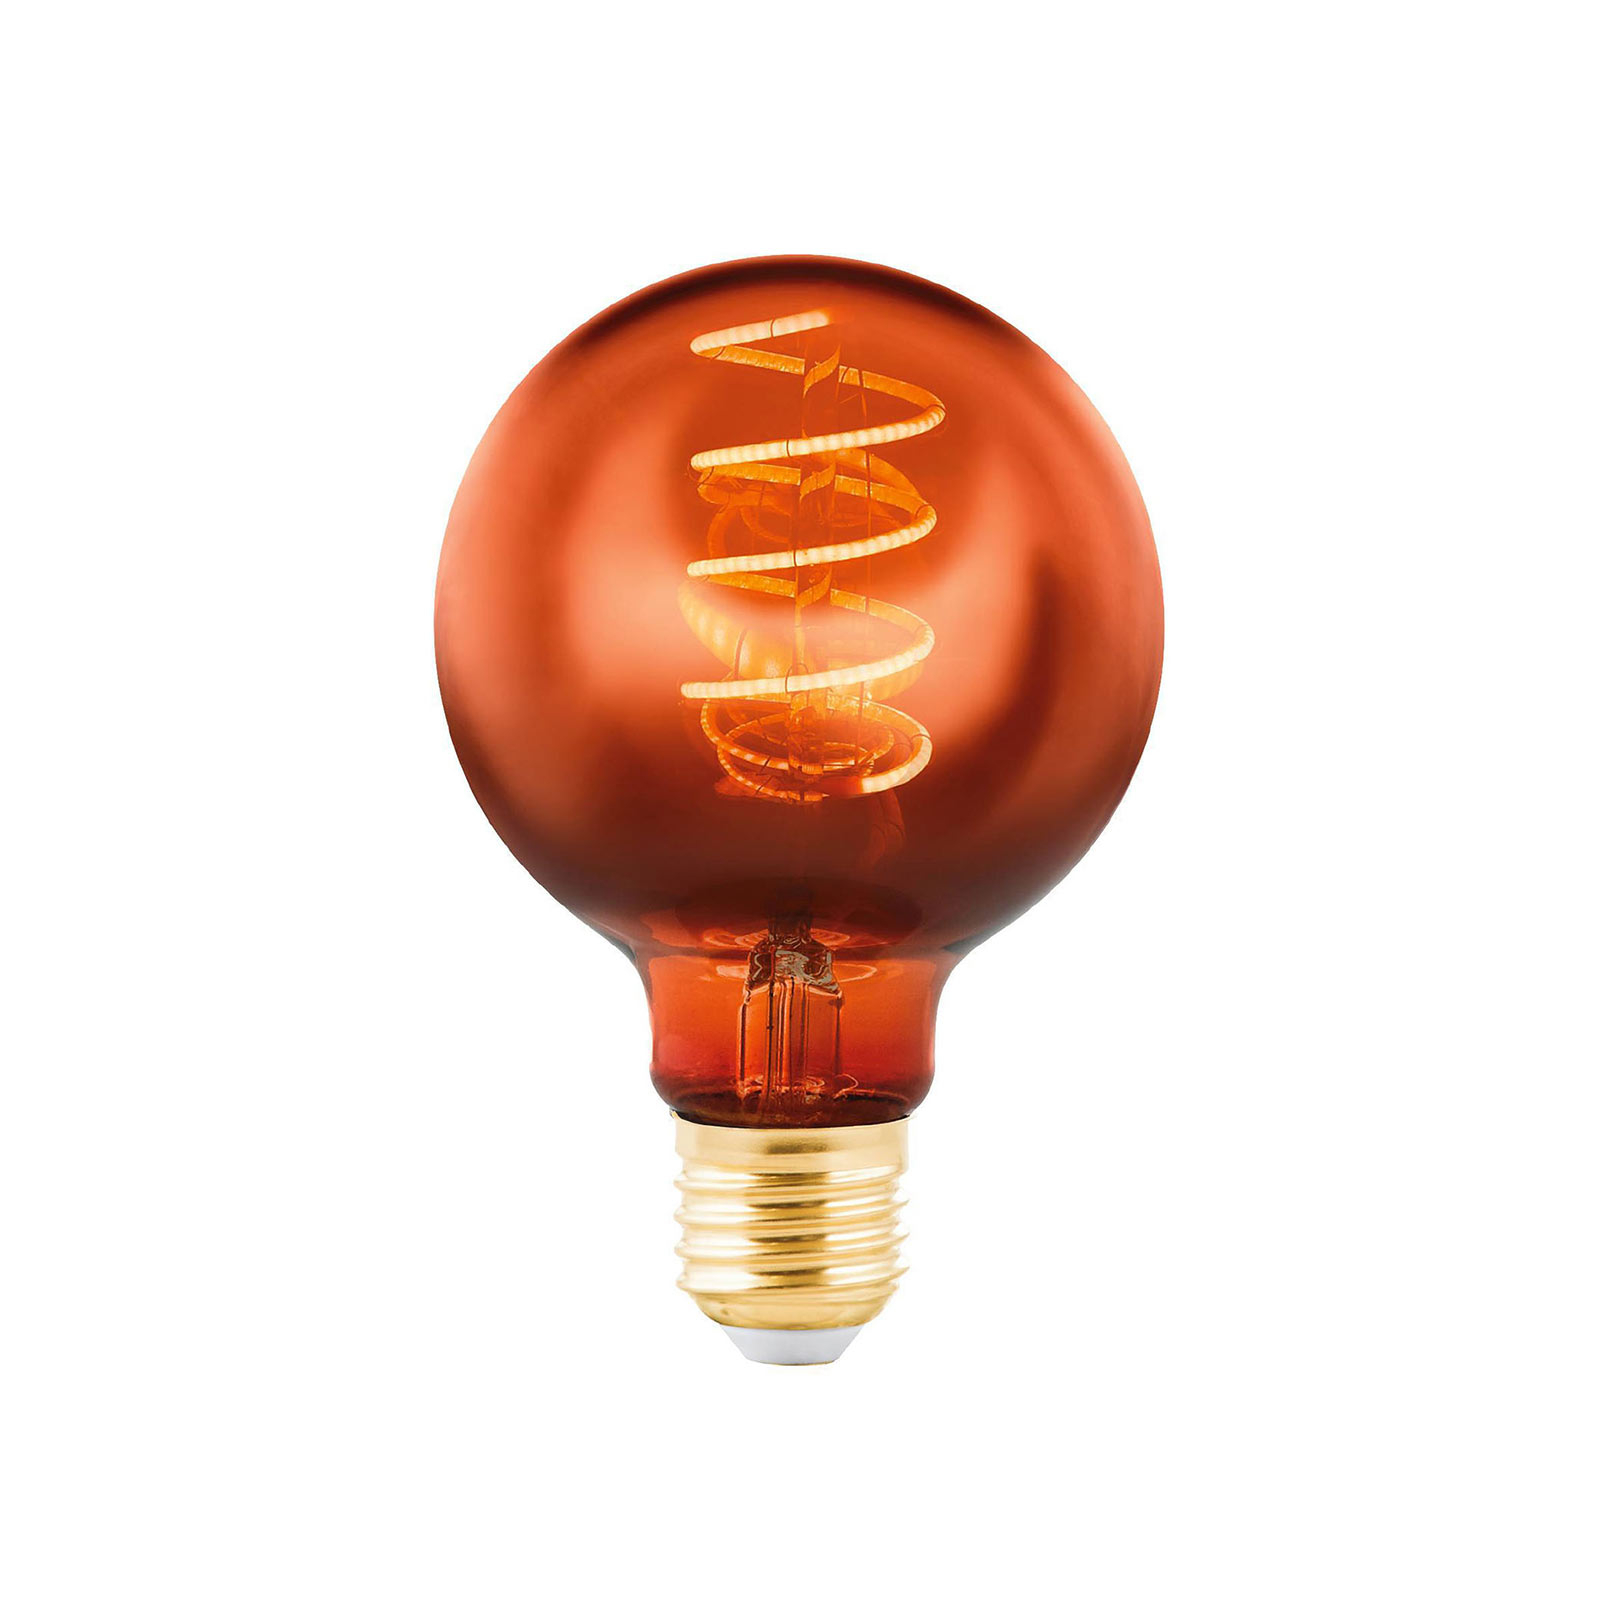 LED-Globelampe E27 4W kupfer bedampft Ø 8 cm